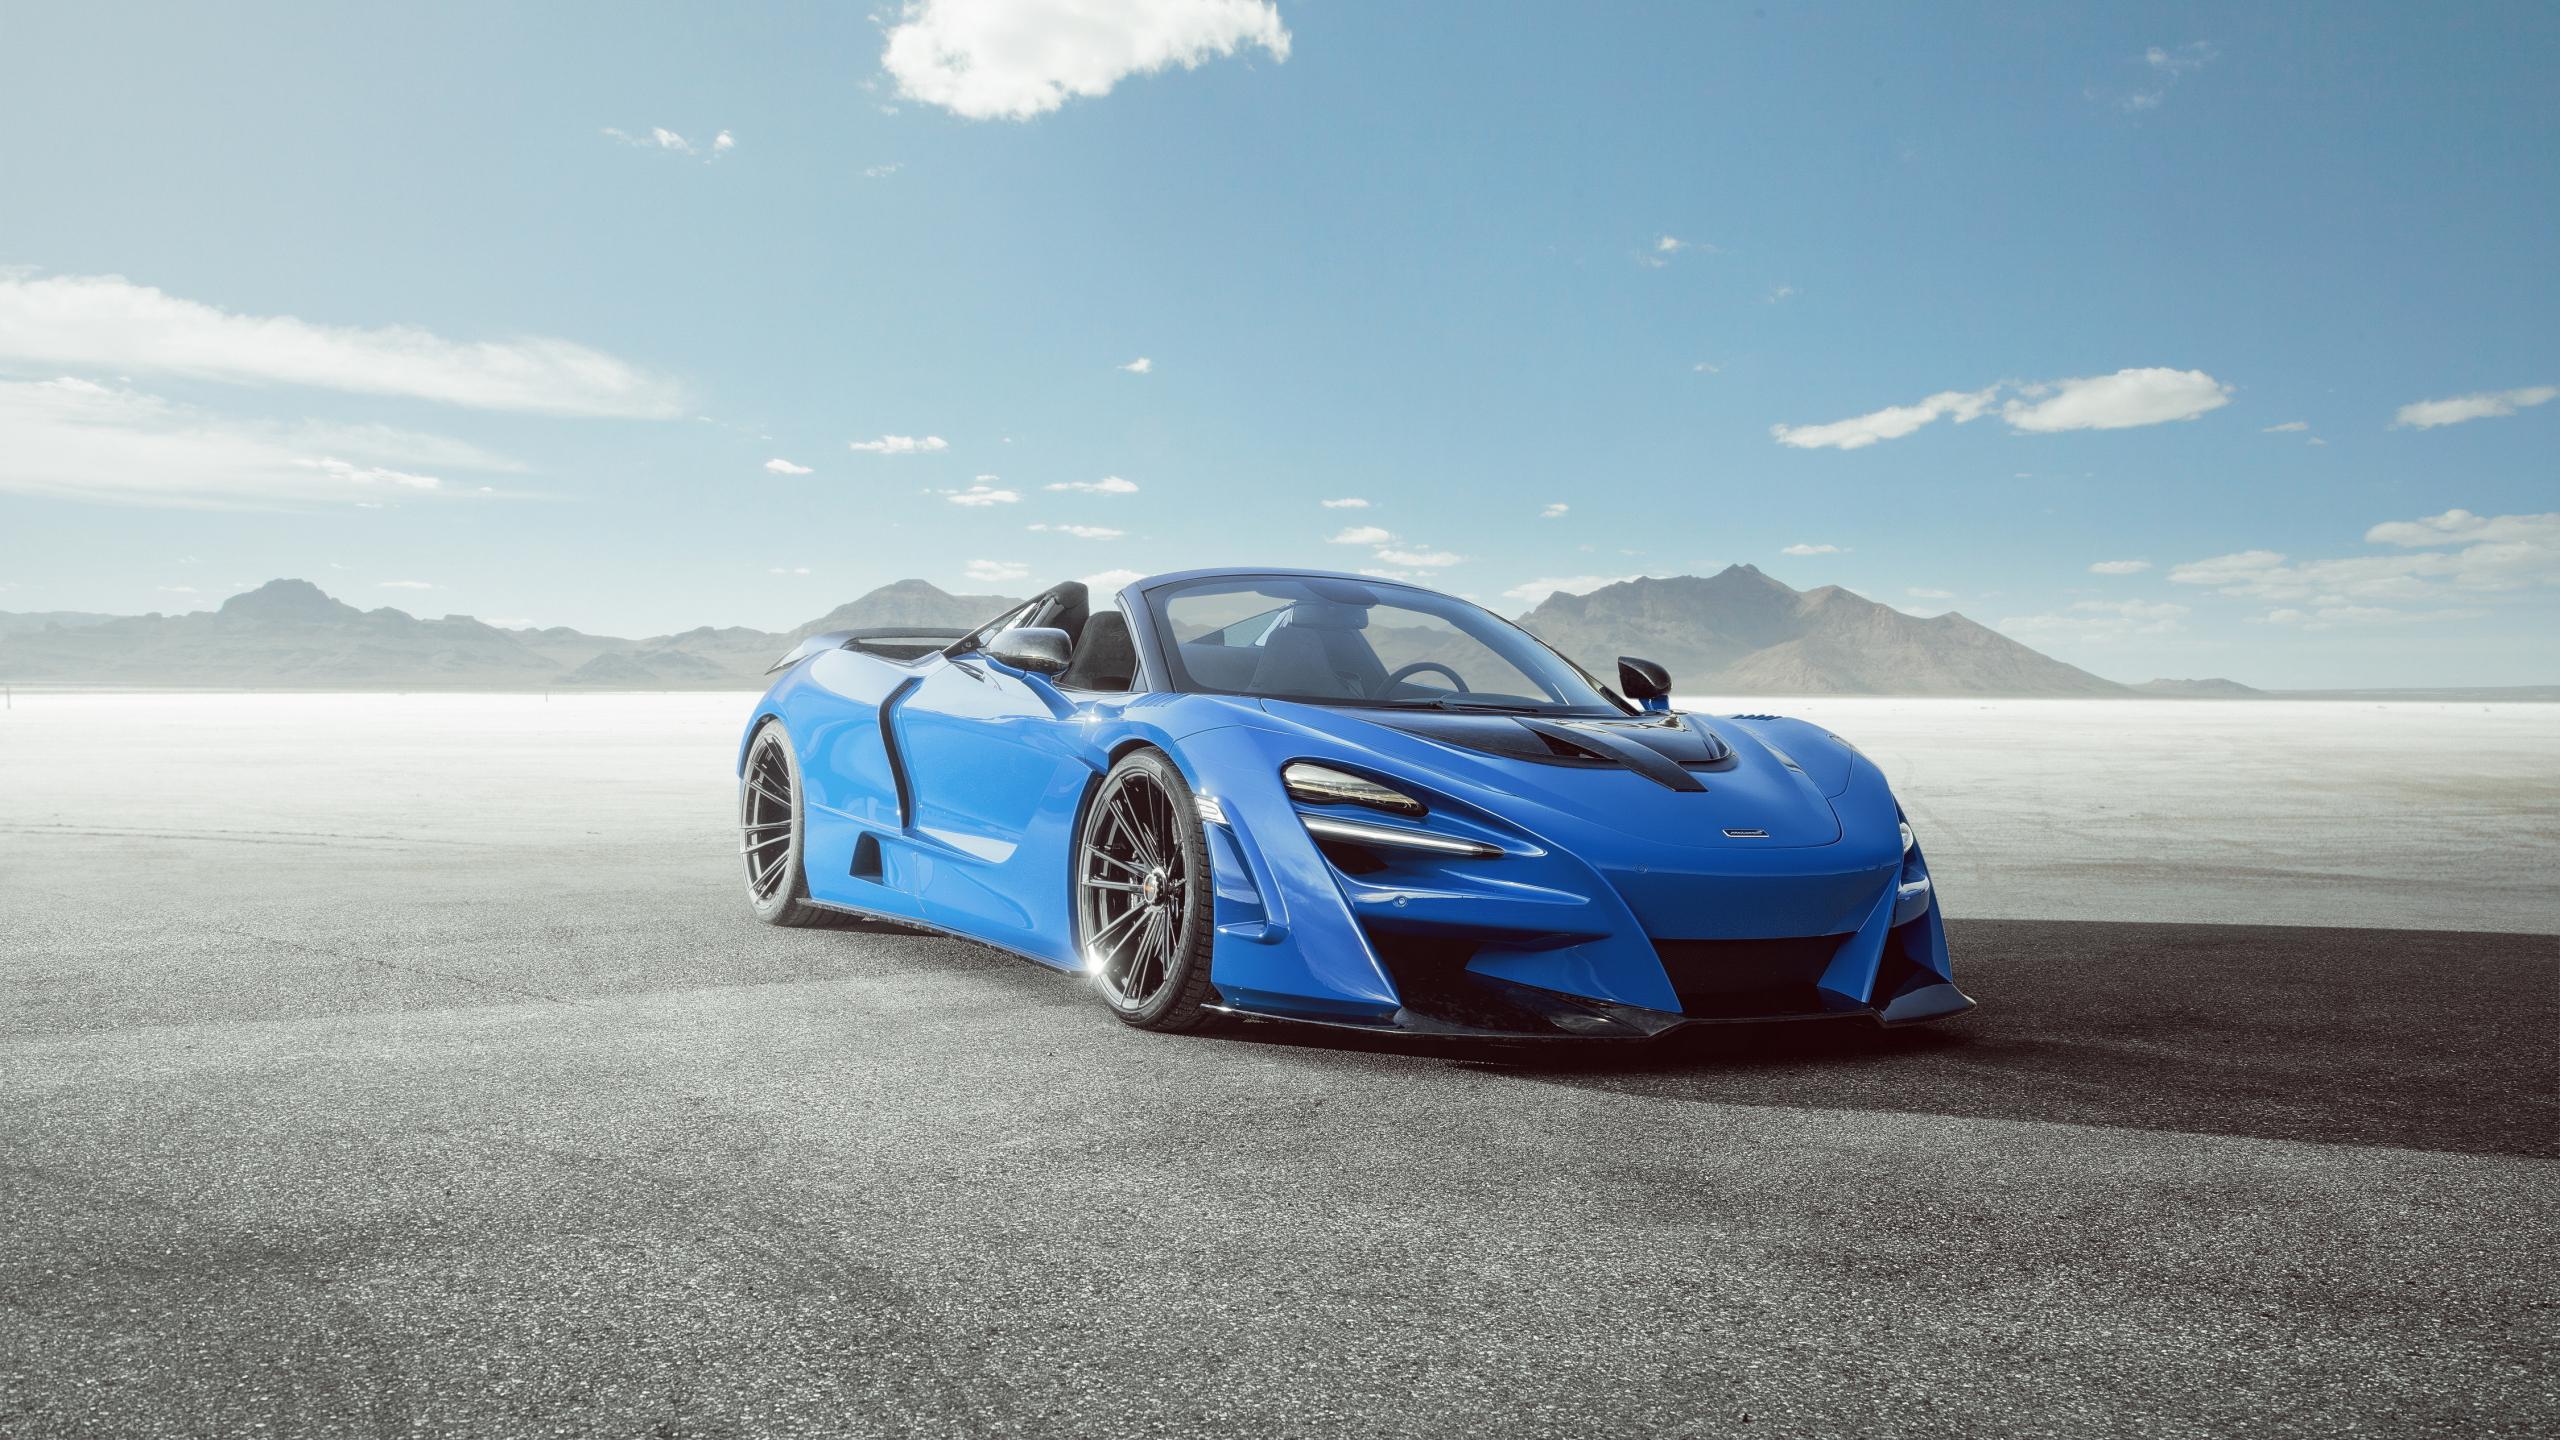 Download 2560x1440 Wallpaper Blue Car 2020 Mclaren 720s N Largo Dual Wide Widescreen 16 9 Widescreen 2560x1440 Hd Image Background 23879